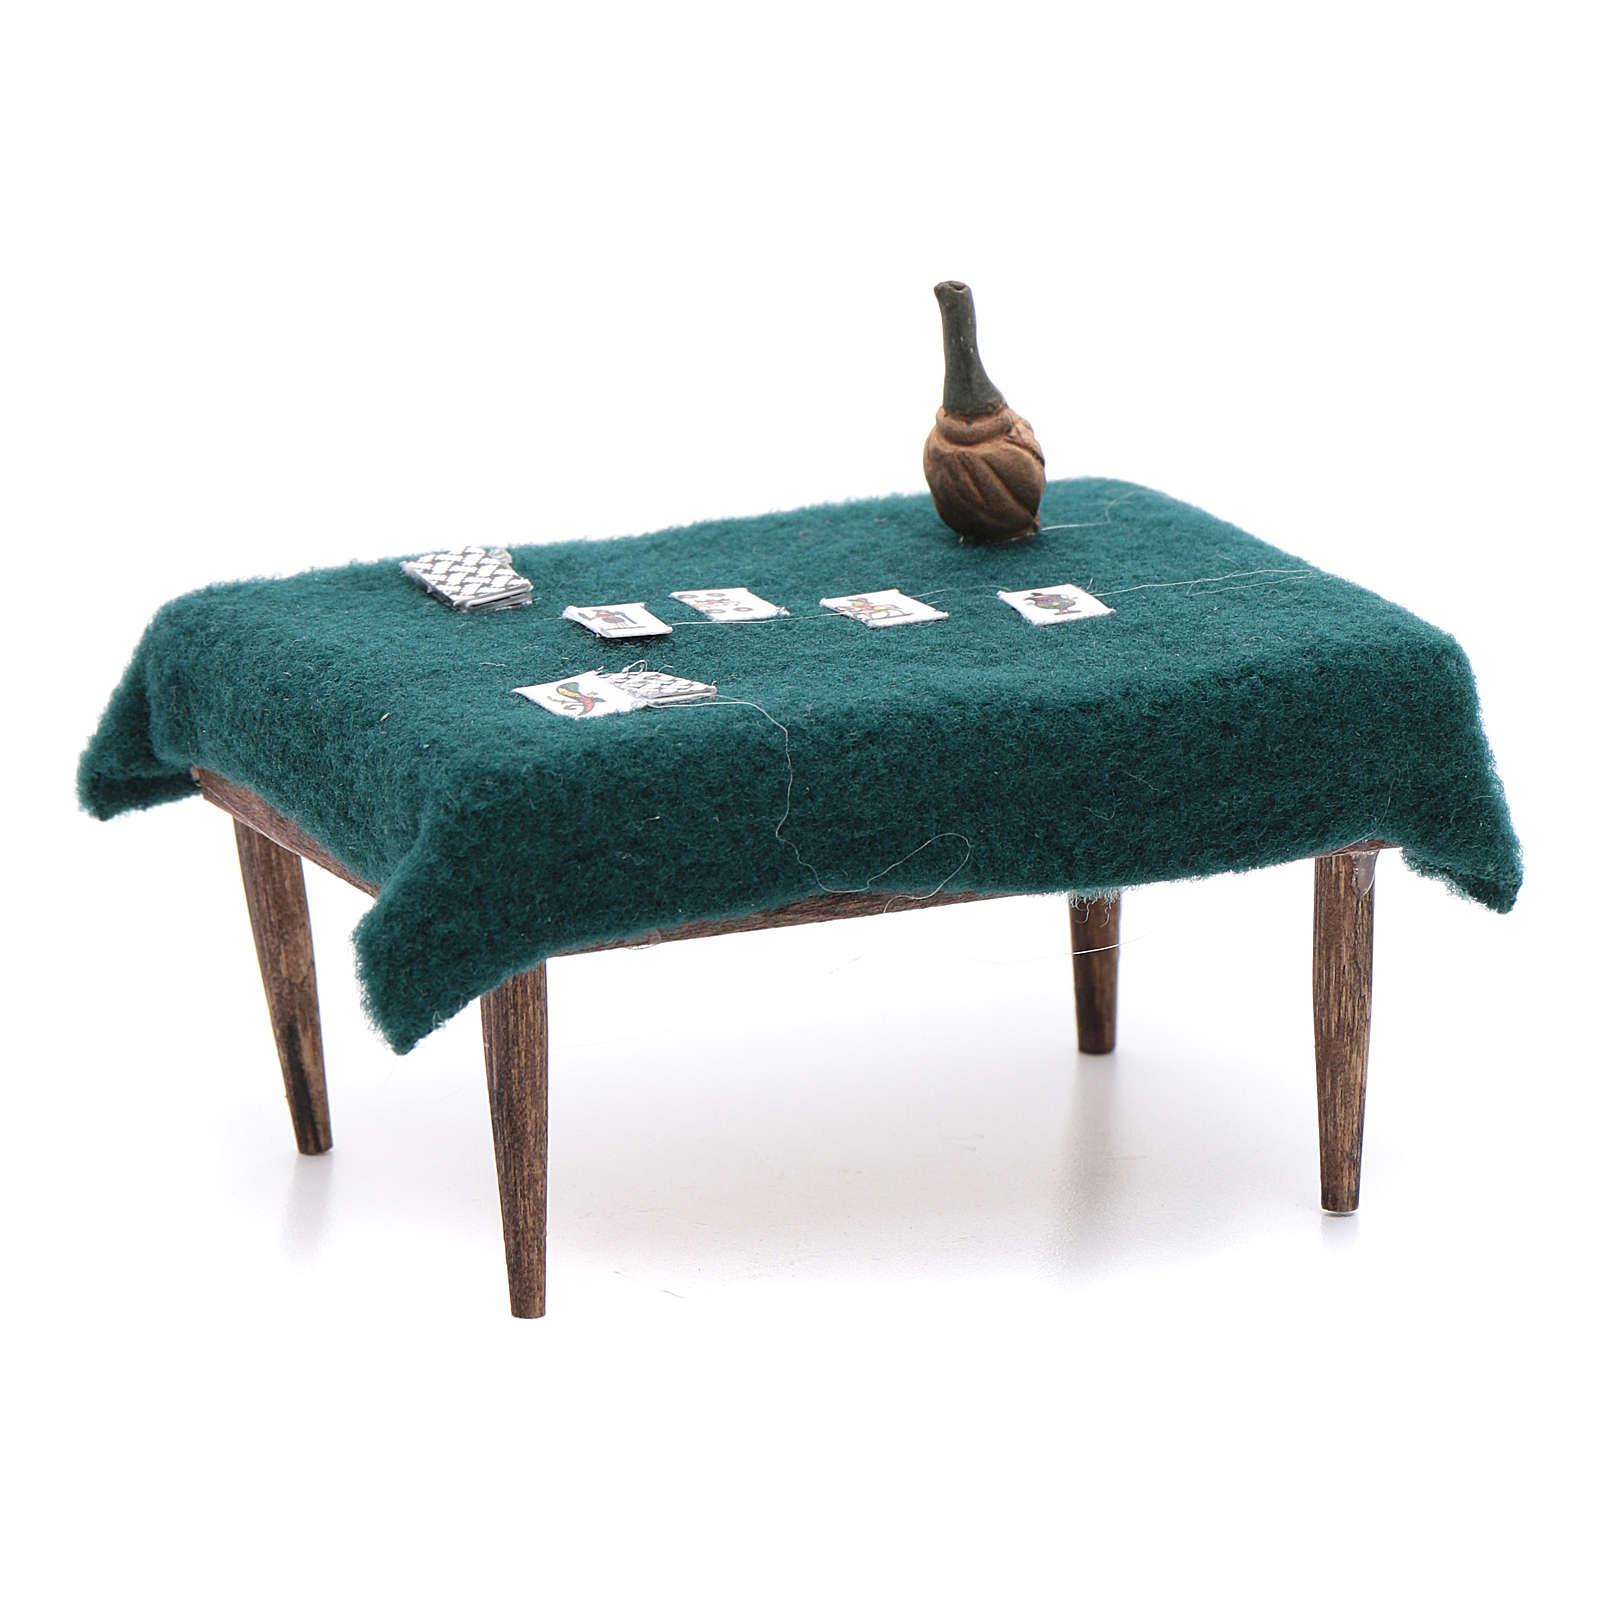 Tavolo carte presepe napoletano 5x10x5 cm 4